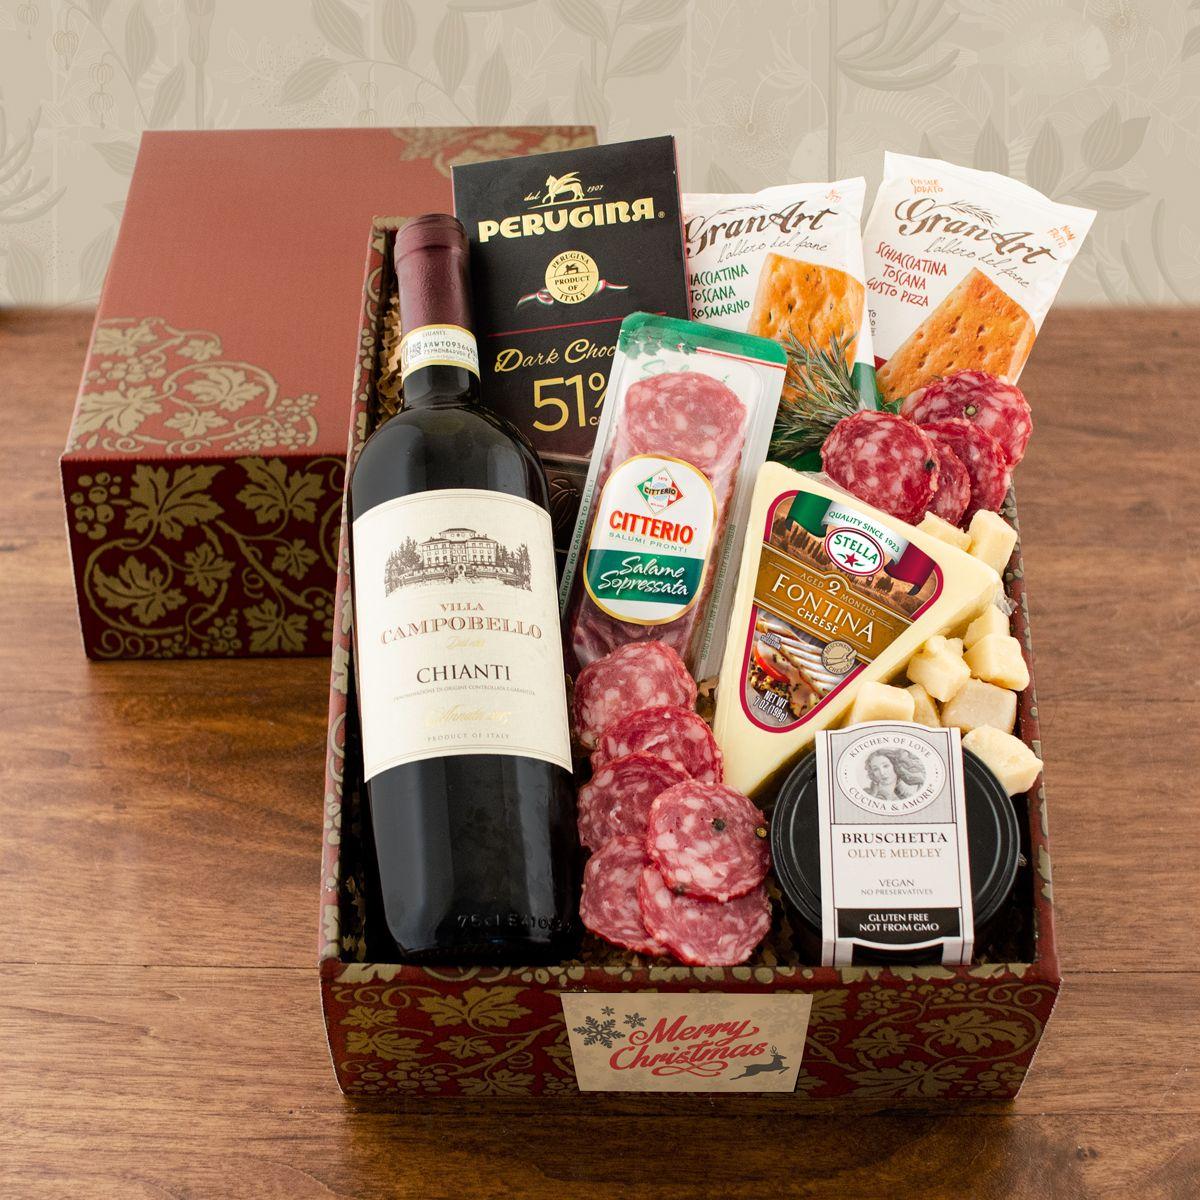 Buona Vita Italian Vino Antipasto Gift Box Christmas Wine Gift Baskets Wine Baskets Wine Gift Box Ideas